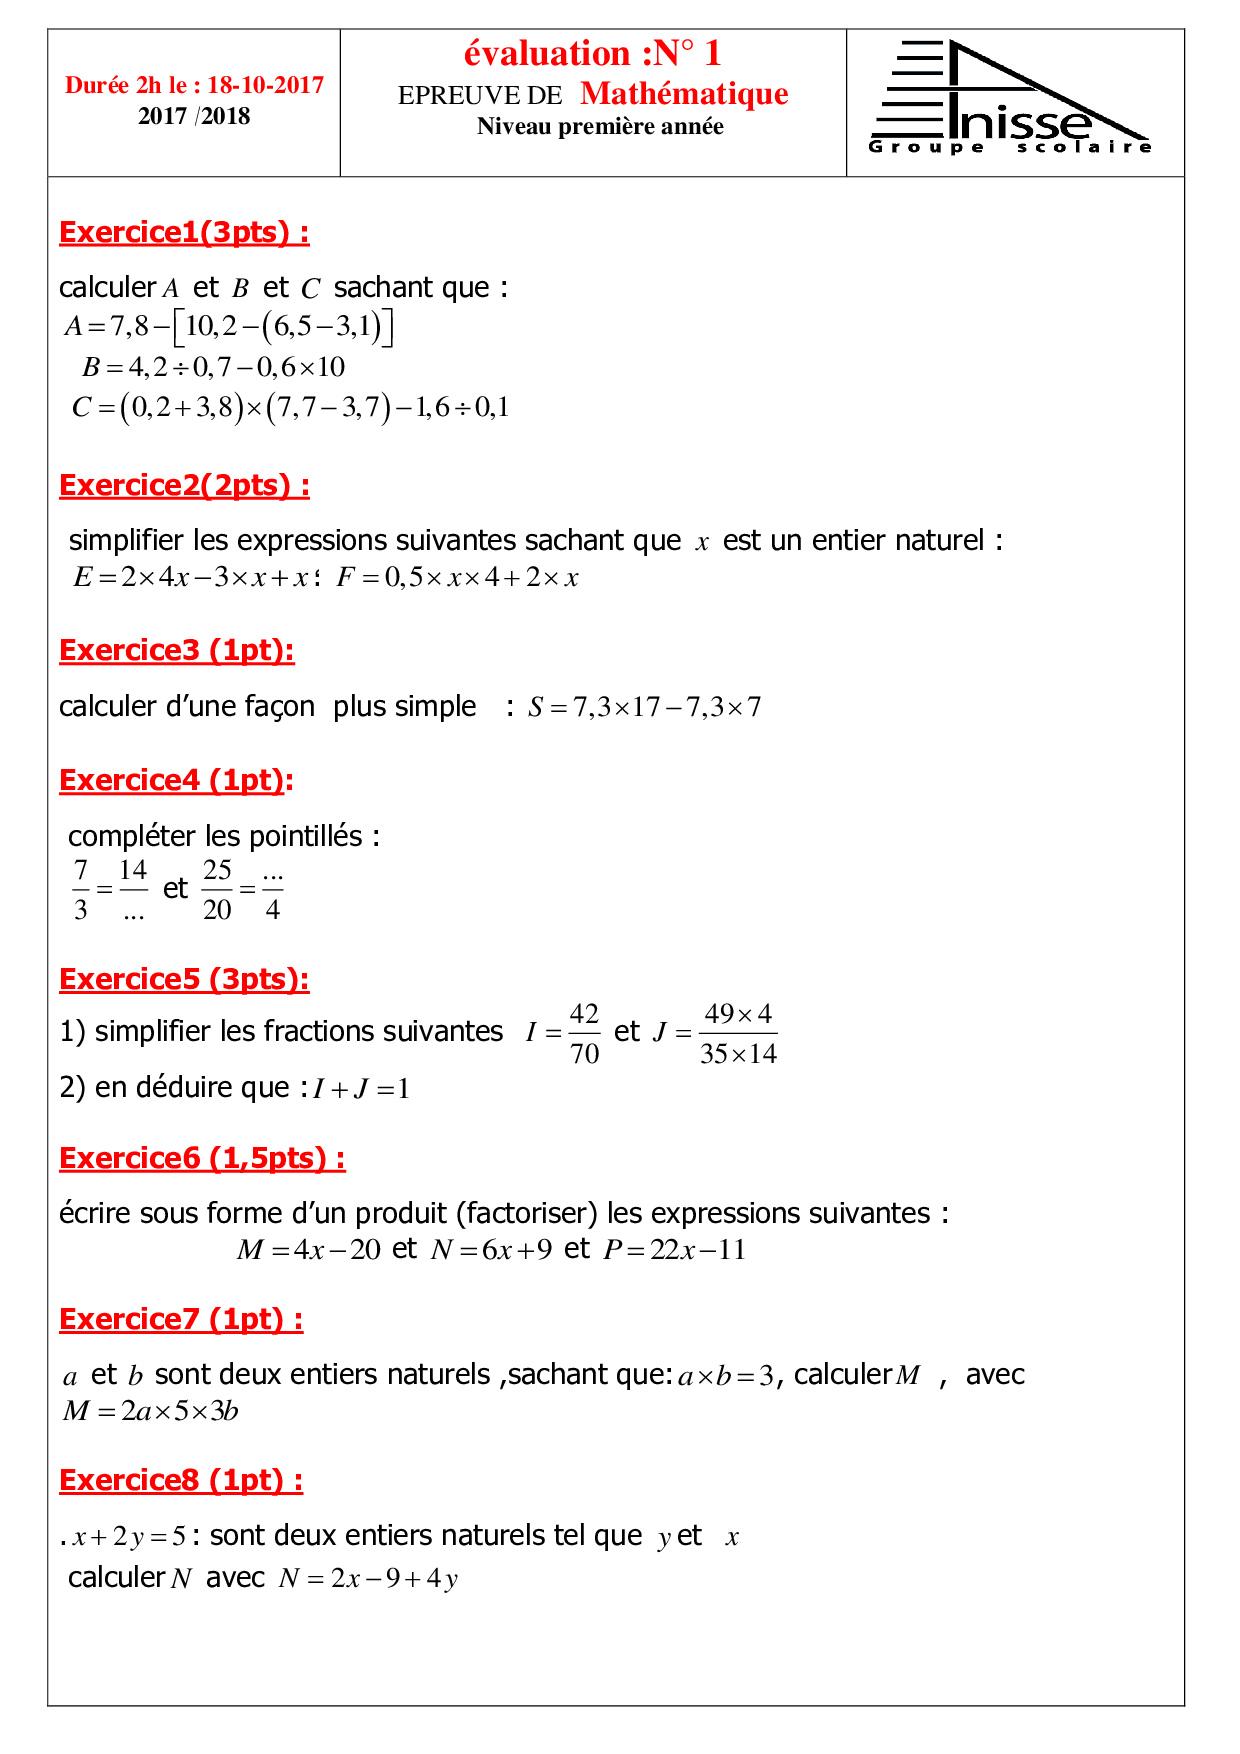 Devoir 1 Modele 1 Mathematiques 1ac Semestre 1 Alloschool